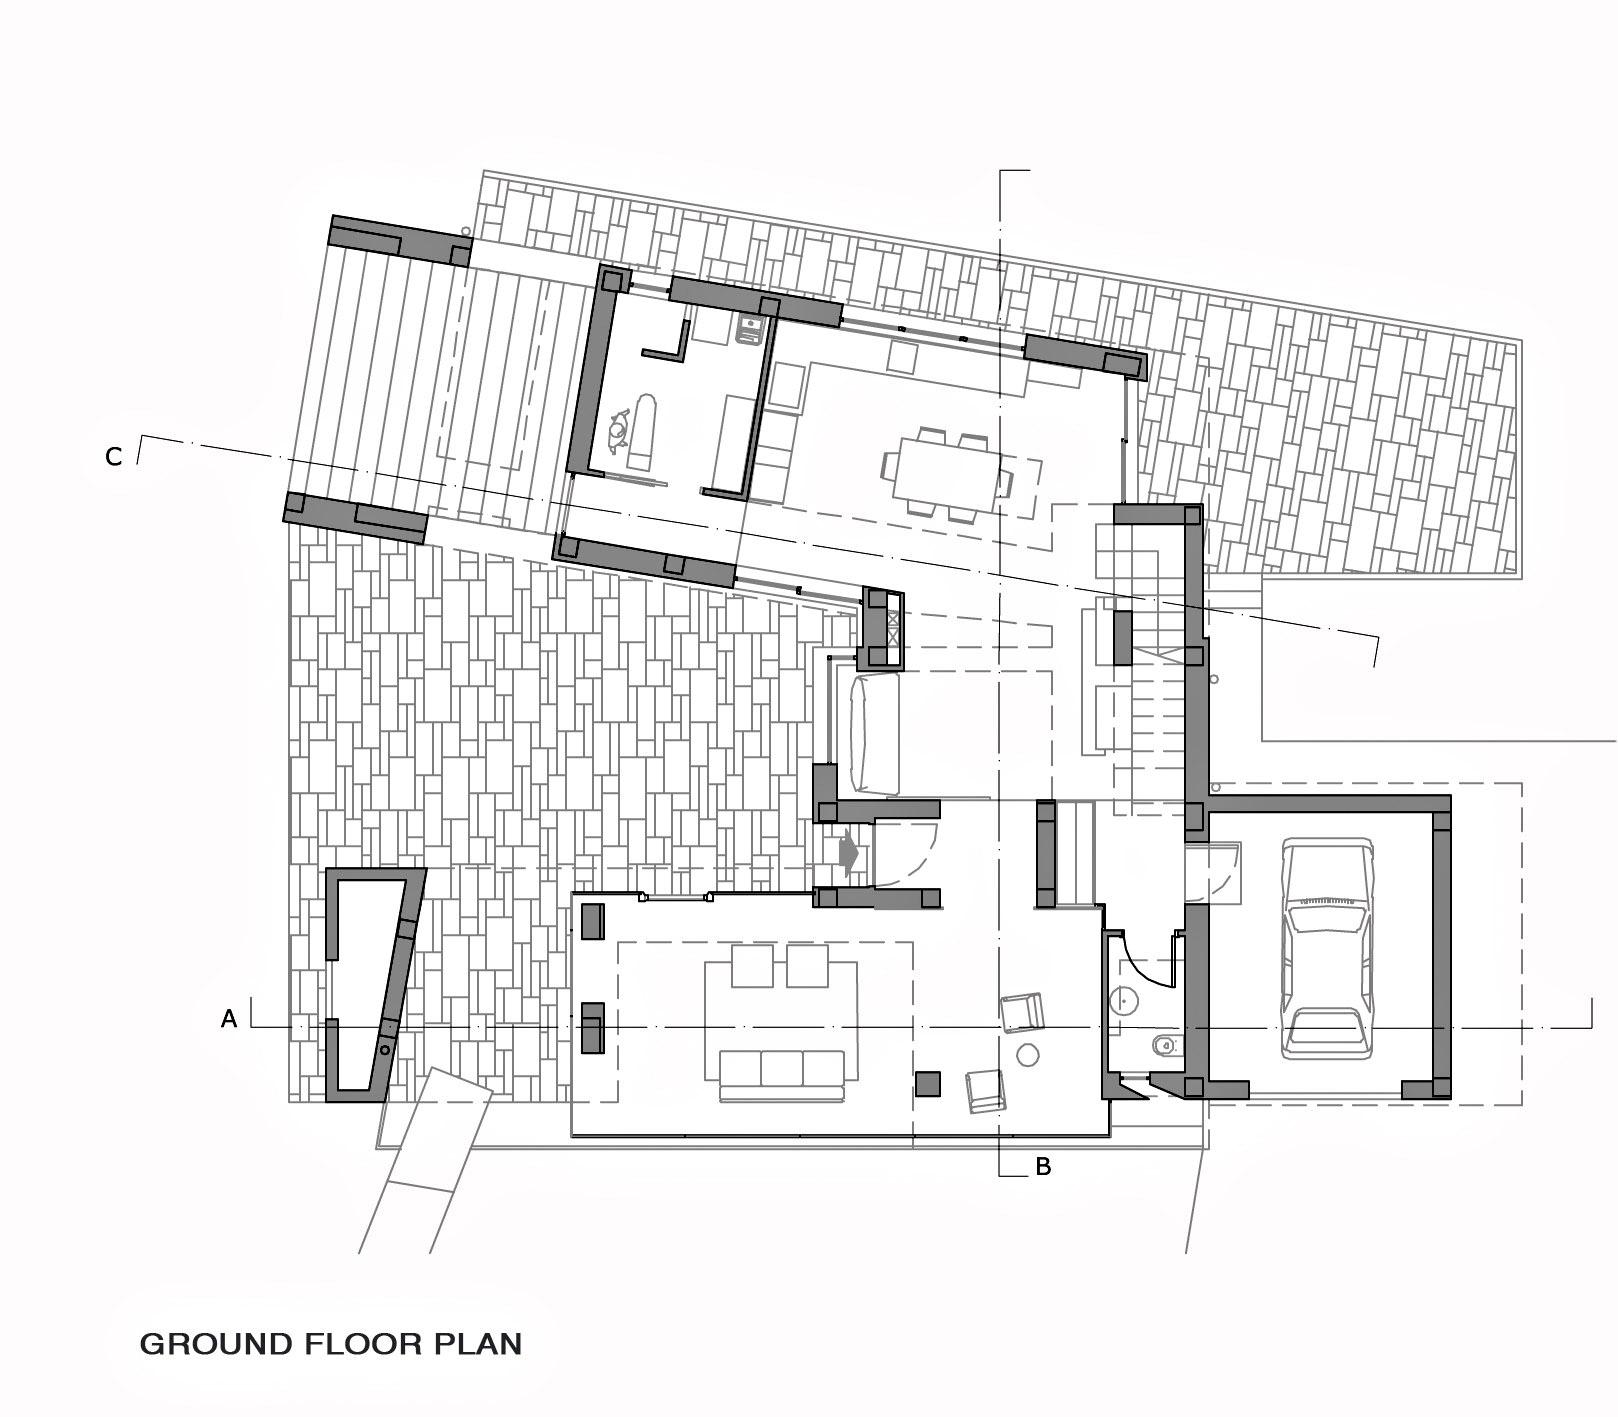 Ground Floor Plan - Villa Di Gioia Luxury Residence - Bisceglie, Apulia, Italy